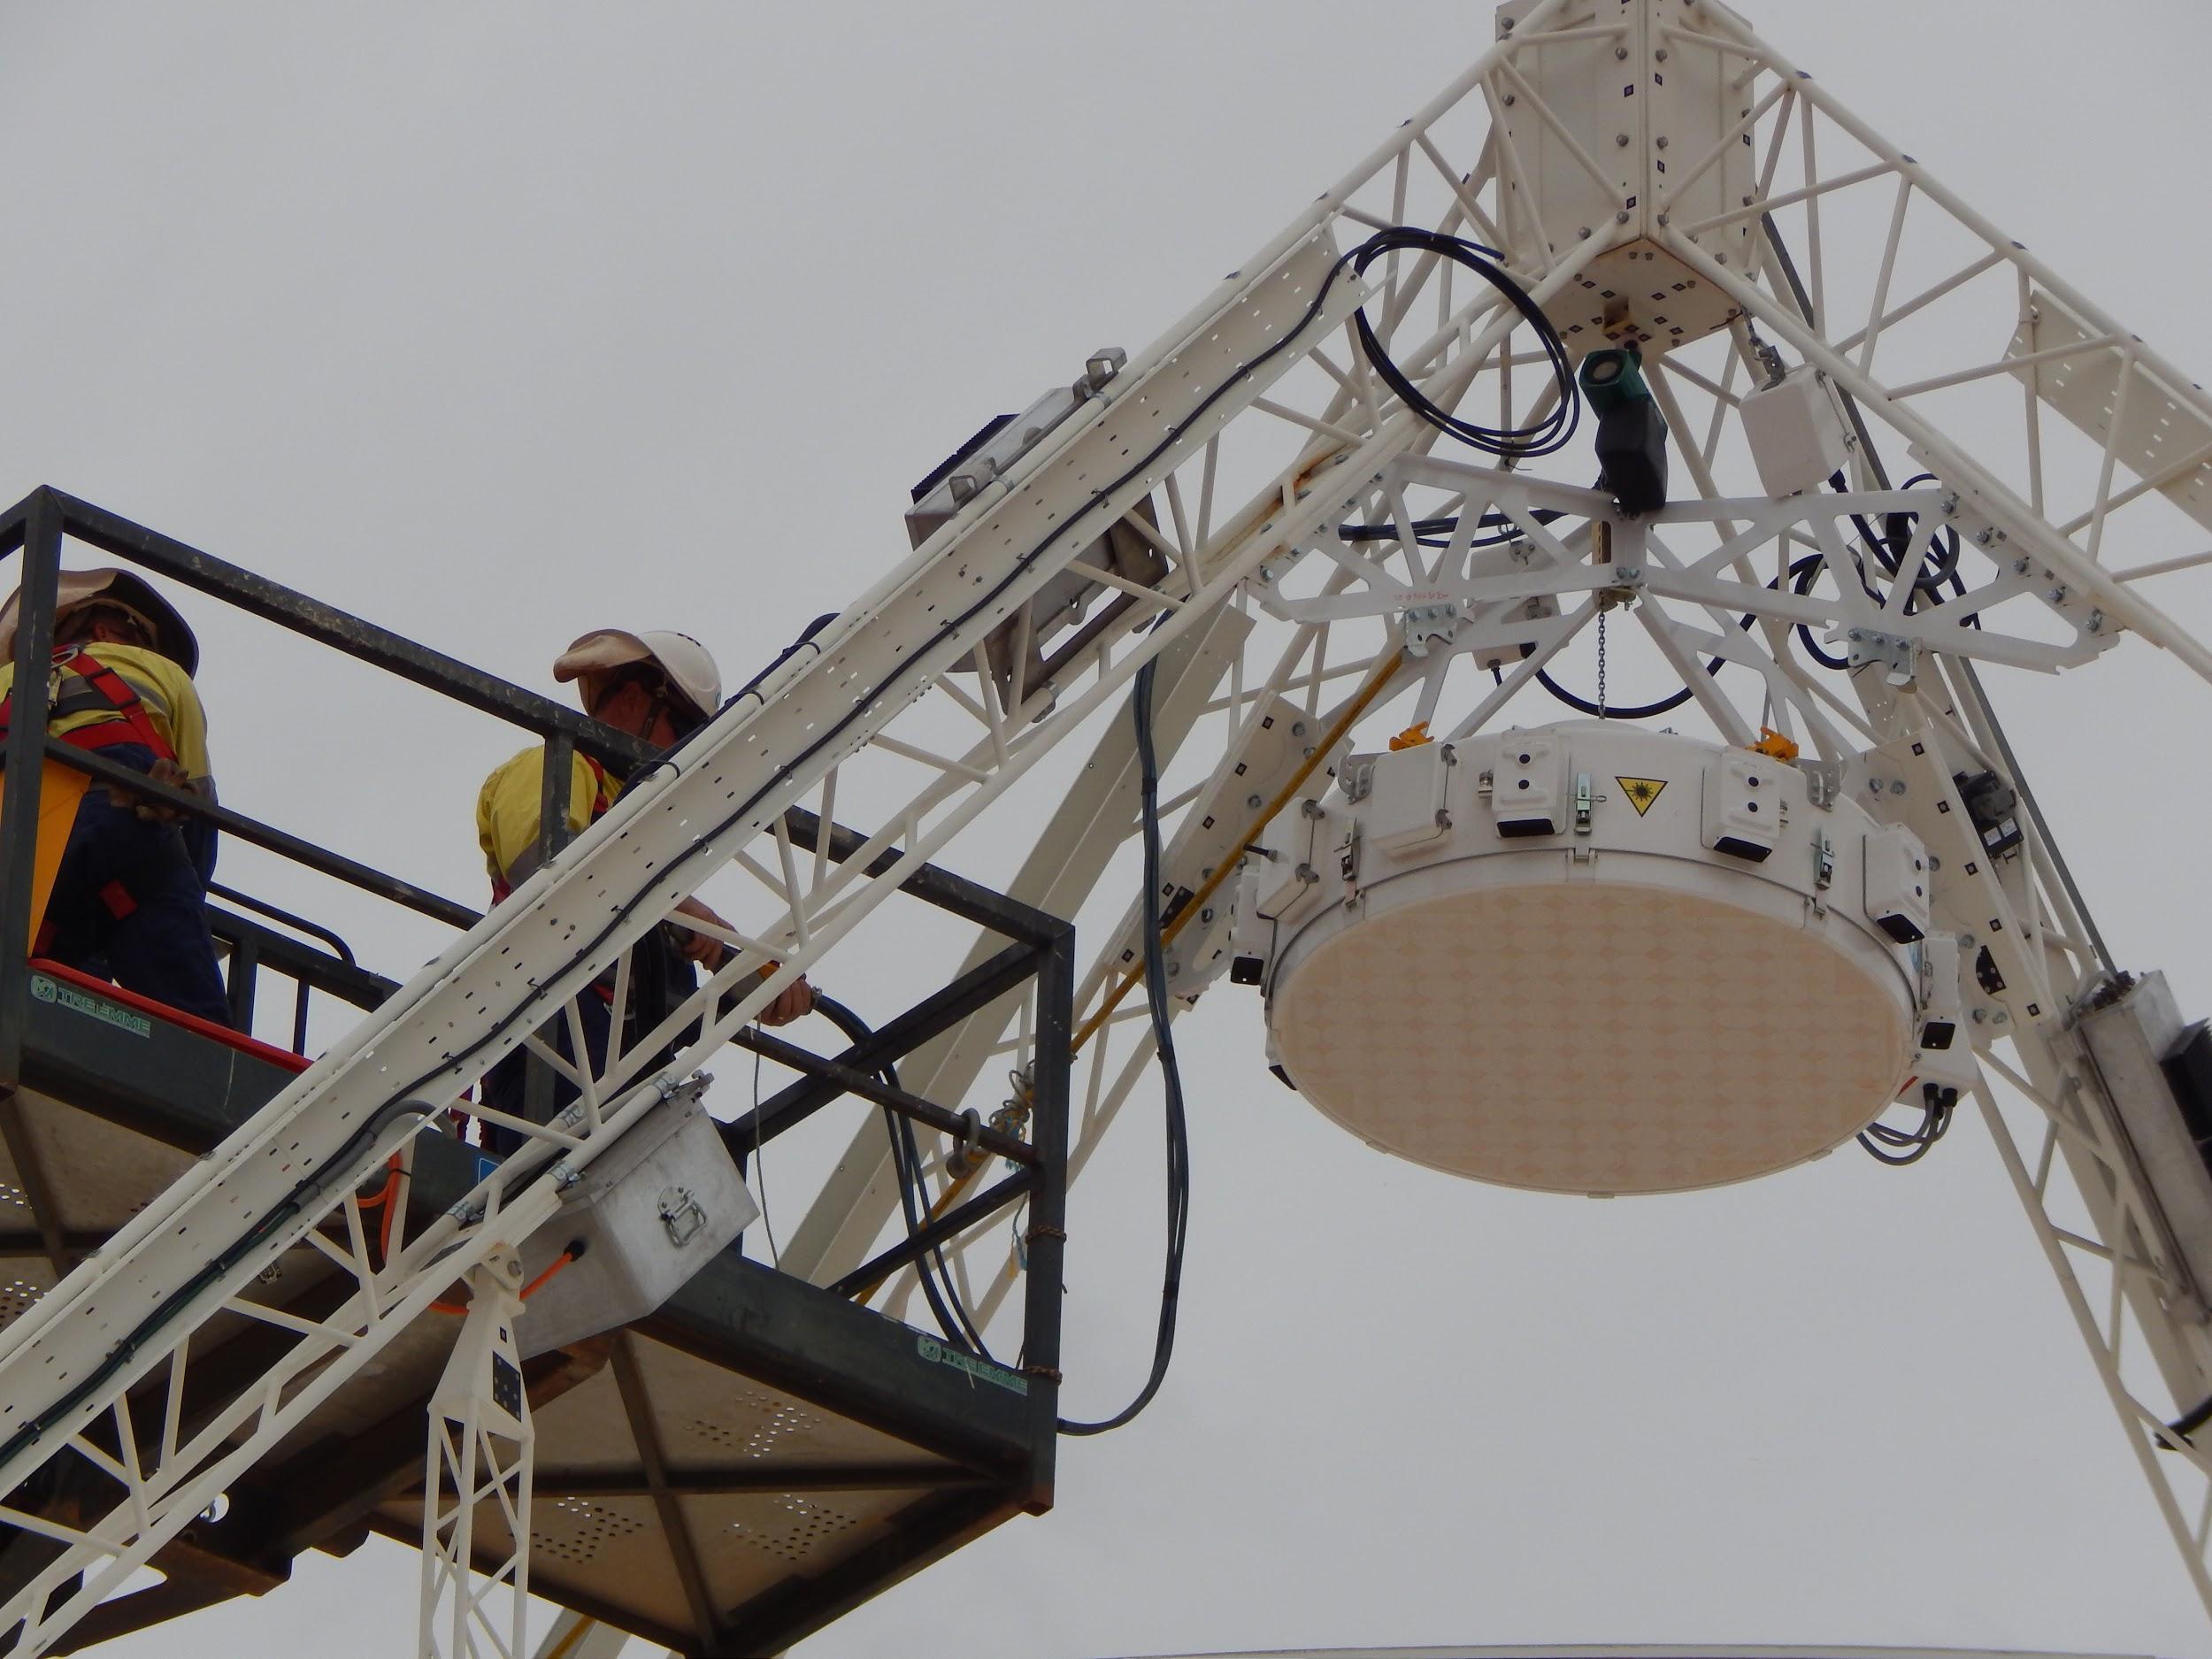 detalle de un Phase Array Feed (o PAF), durante su colocación. Crédito: CSIRO.